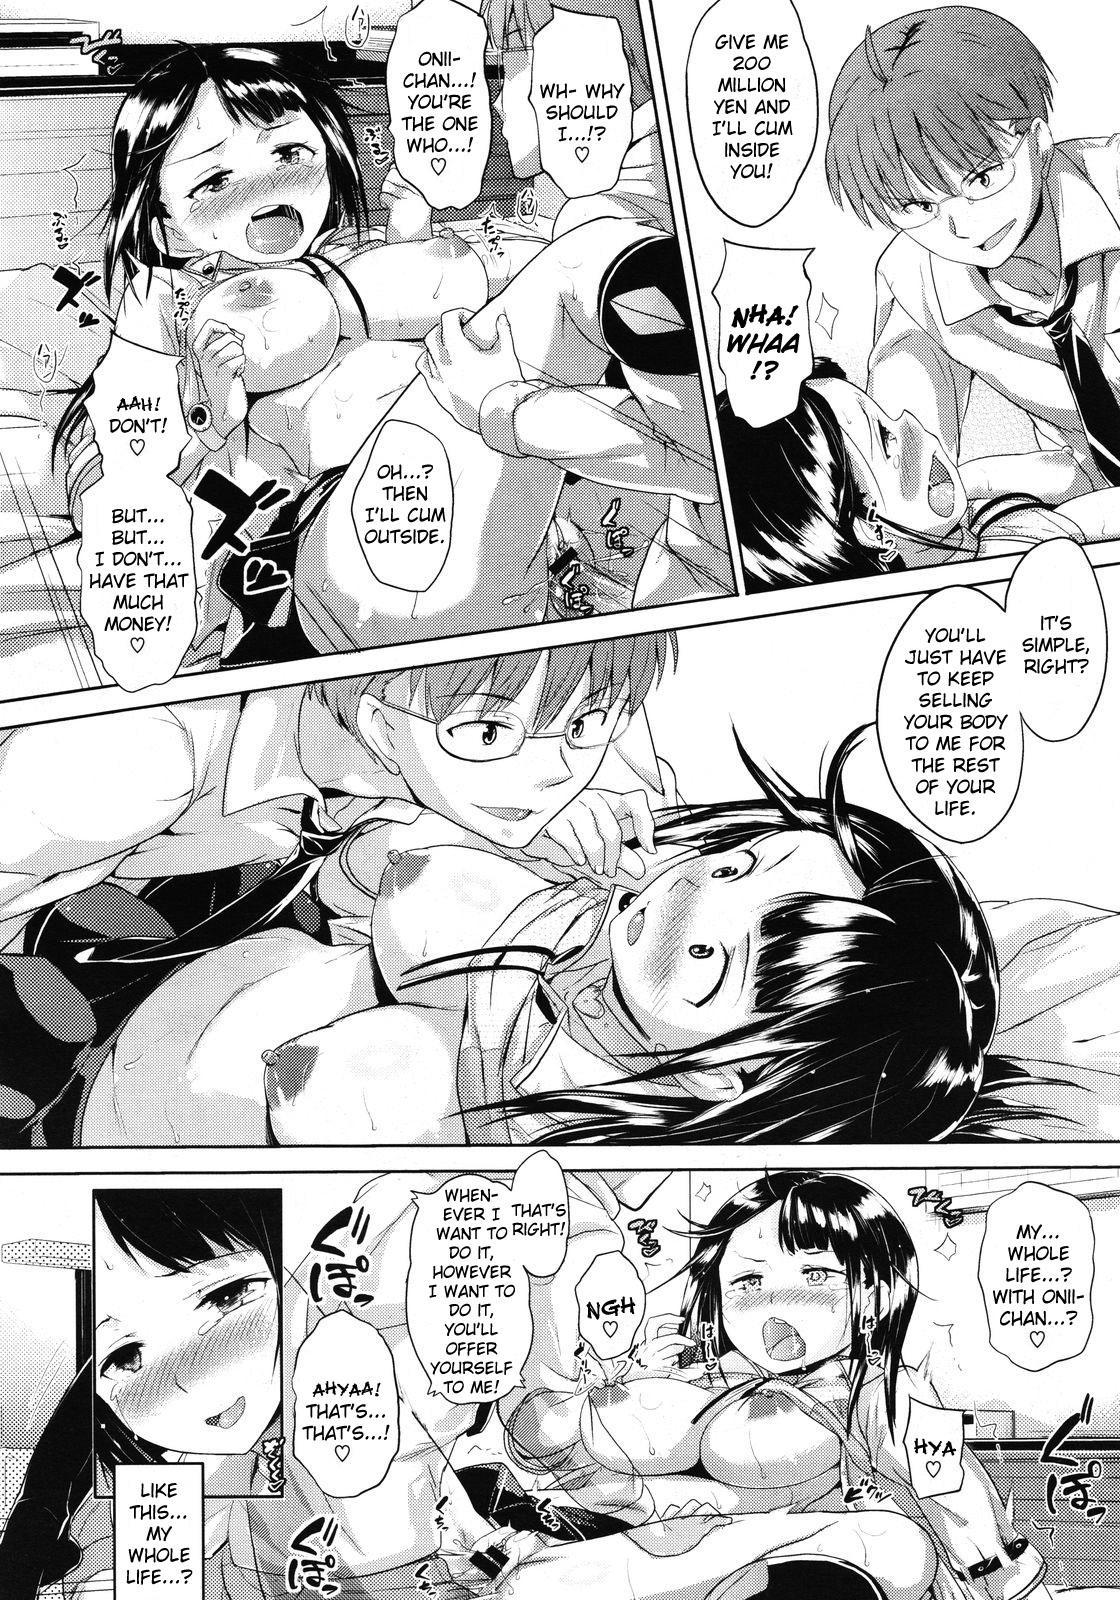 [Knuckle Curve] Kono Manga wa Onii-chan no Teikyou de Ookuri Shimasu | This Manga is an Offer From Onii-chan (COMIC Megastore 2012-01) [English] {doujin-moe.us} 25